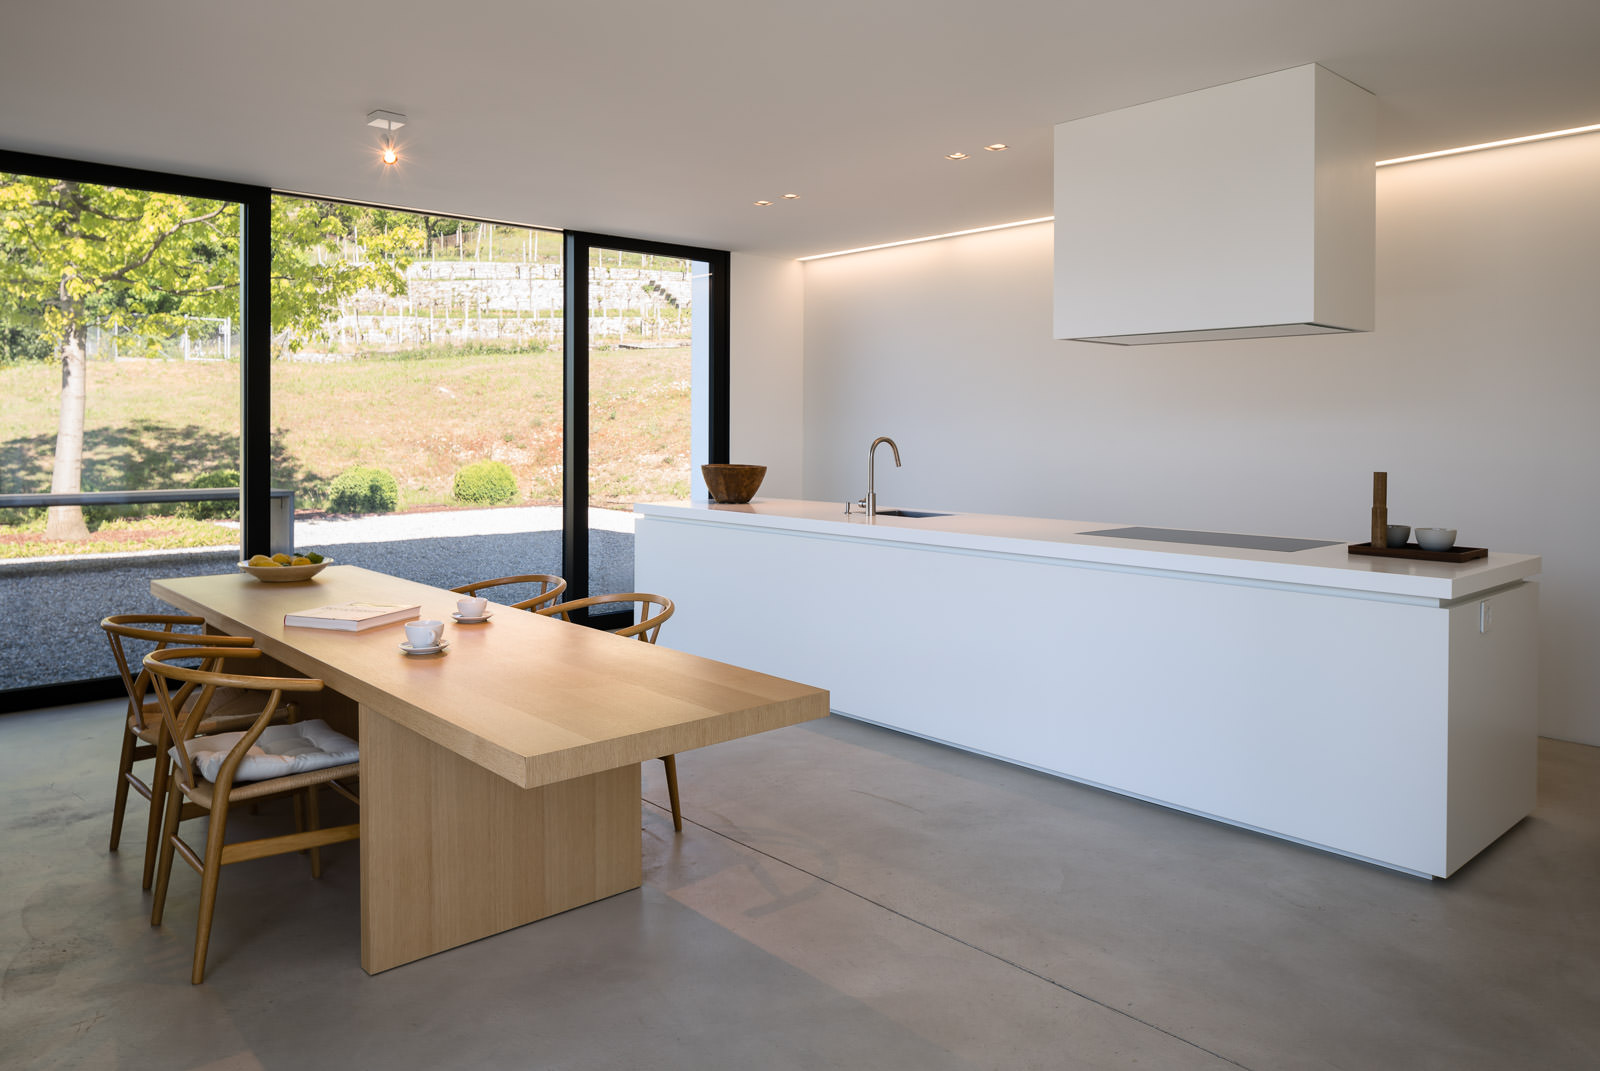 Küche Interieur - Immobilienfoto